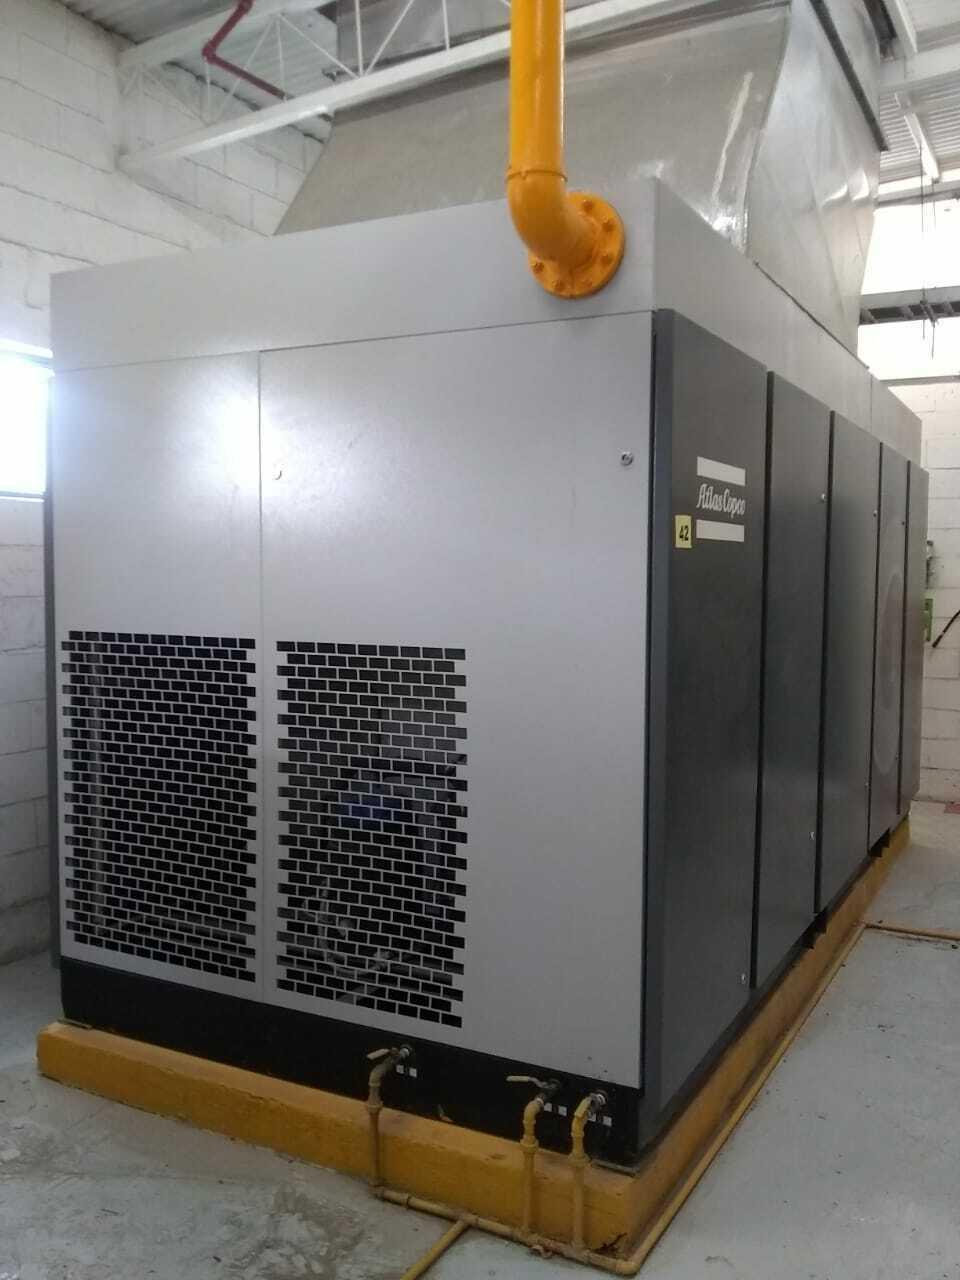 hight resolution of  international wiring diagram atlas copco air compressor ga 315 vsd ff 339 454 6 kw